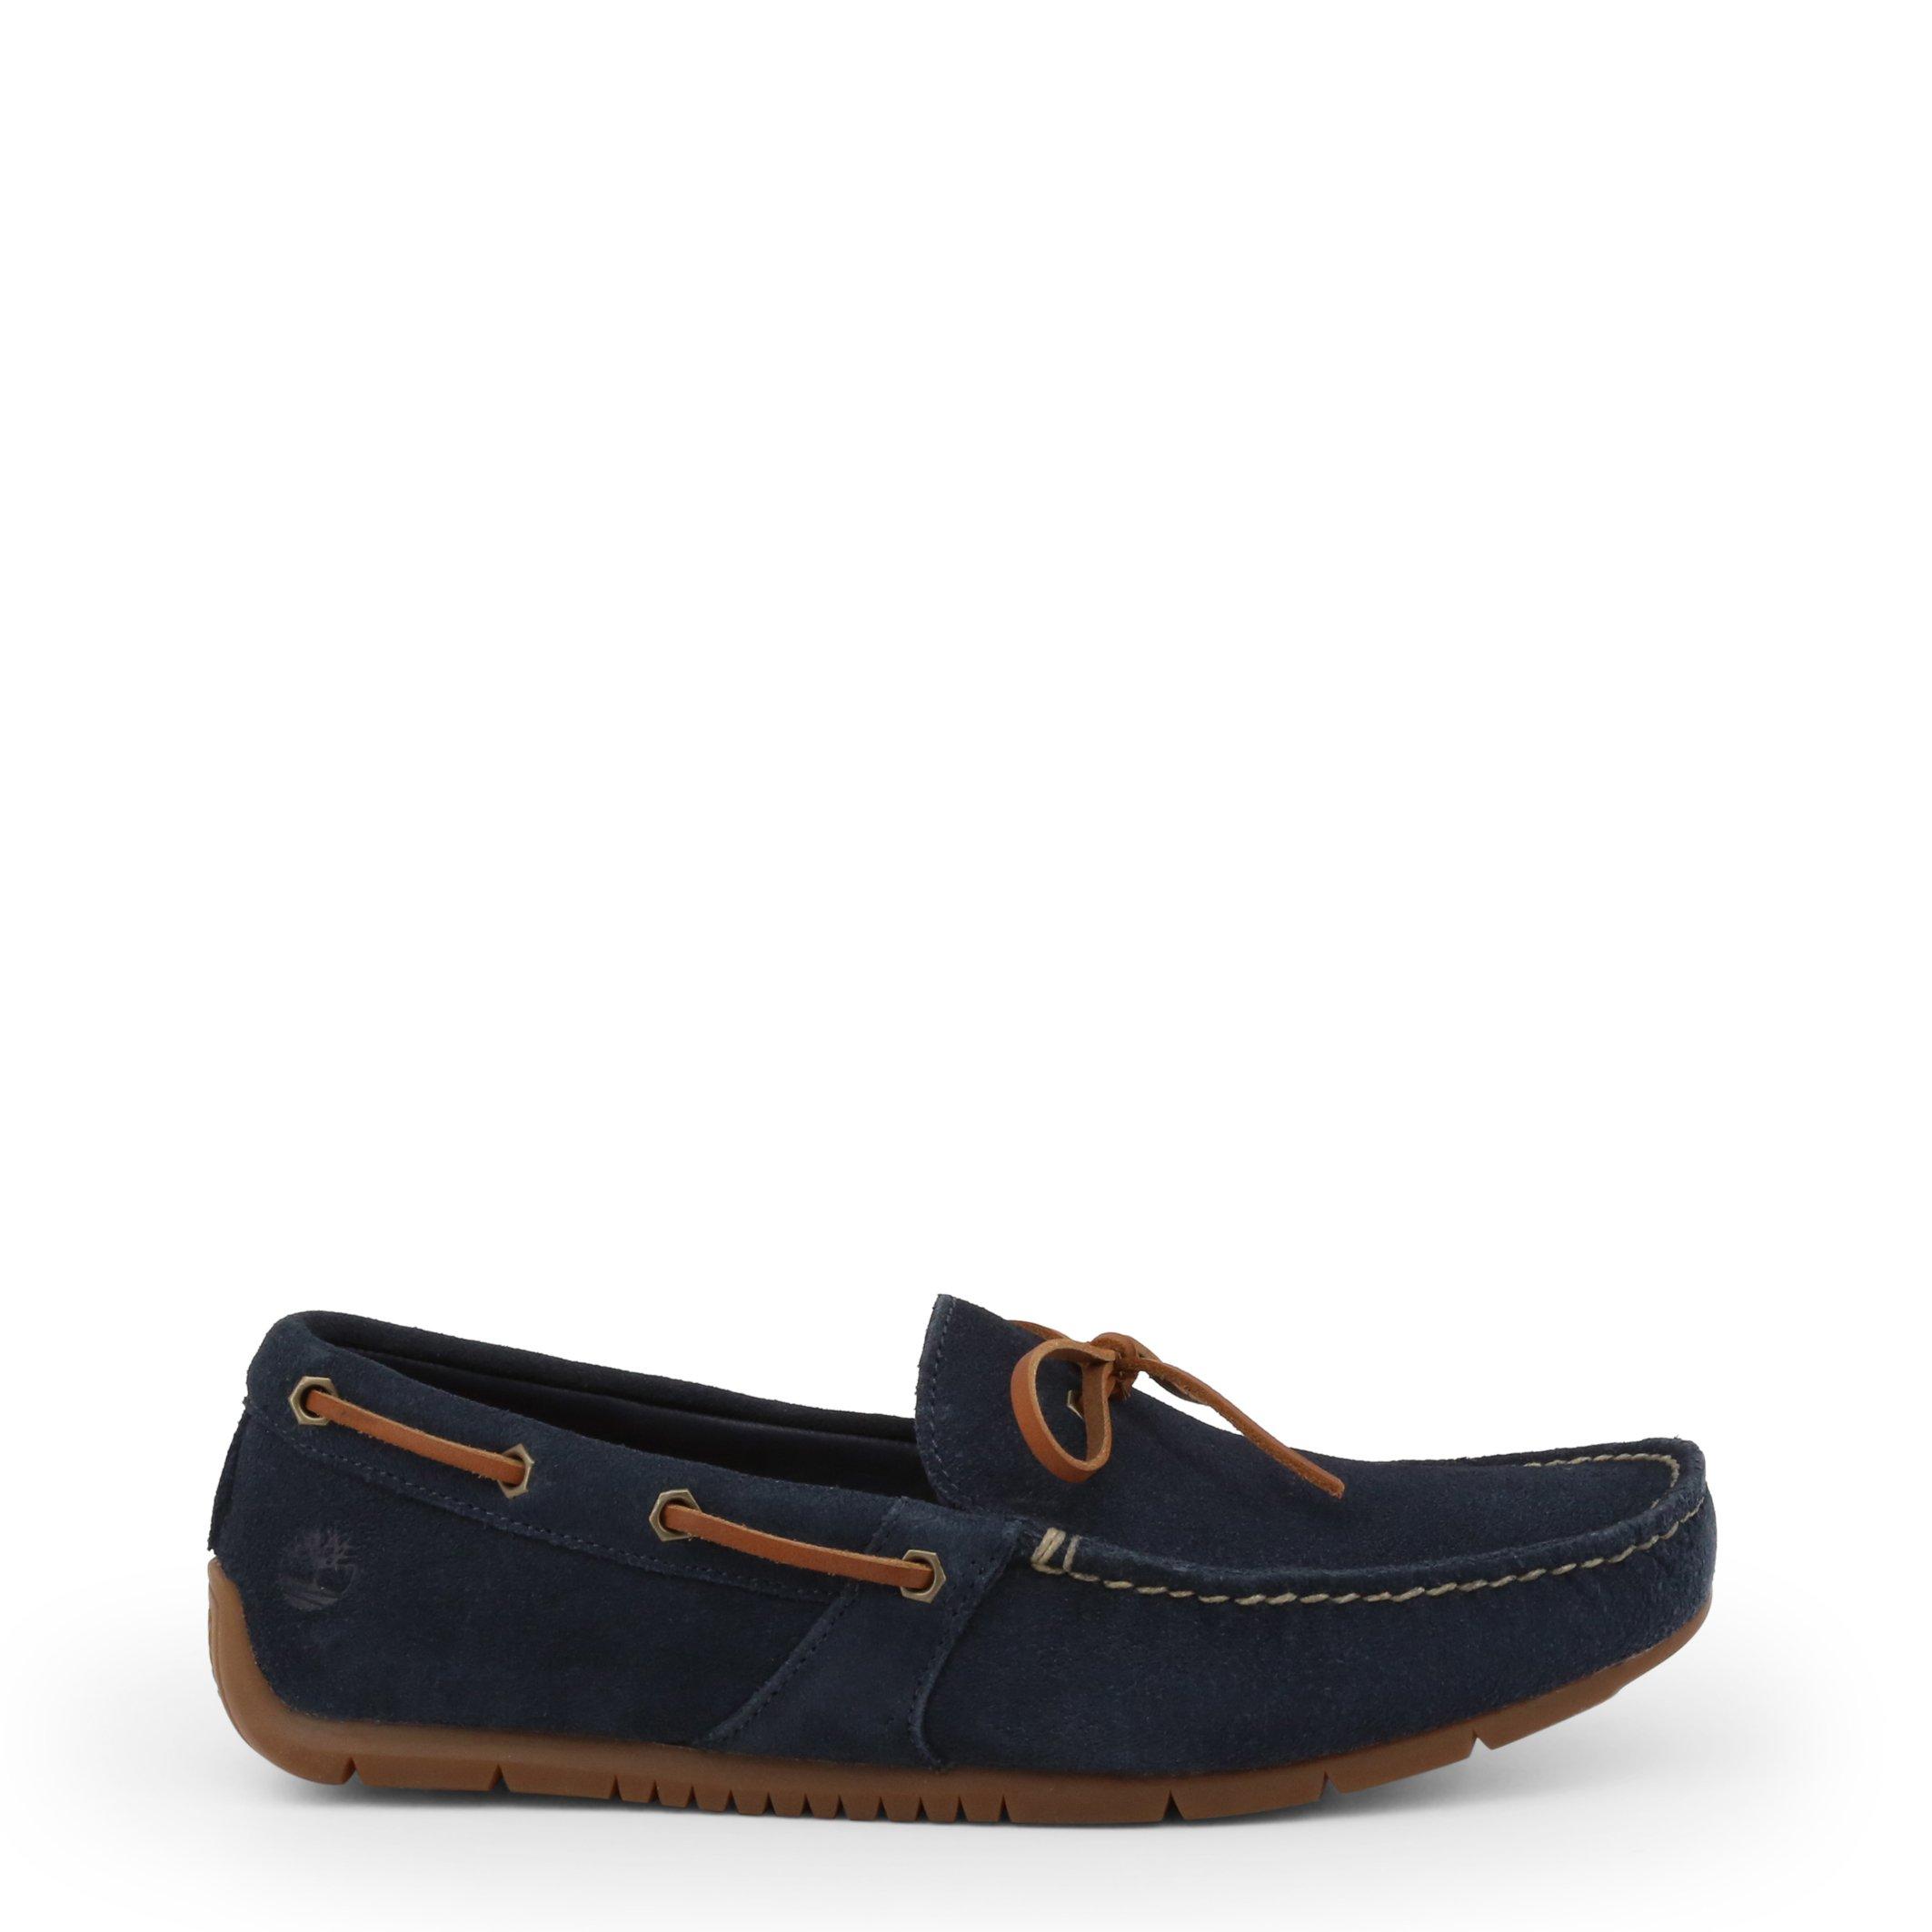 Timberland Men's Loafers Various Colours LEMANS - blue EU 40